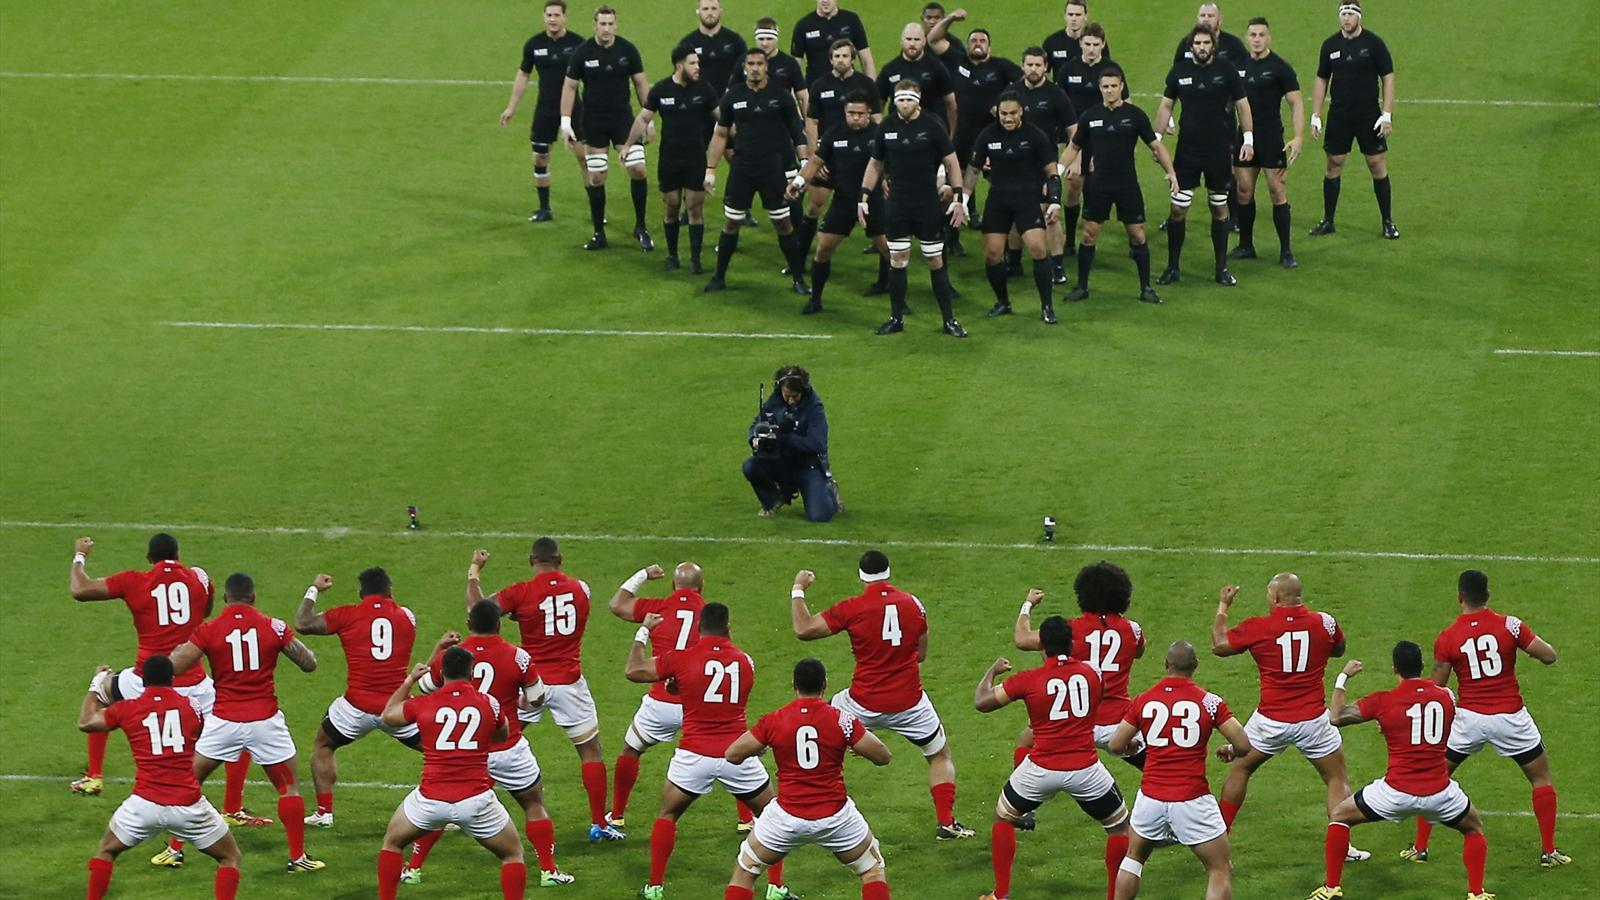 New Zealand v Tonga - Haka vs Sipi Tau